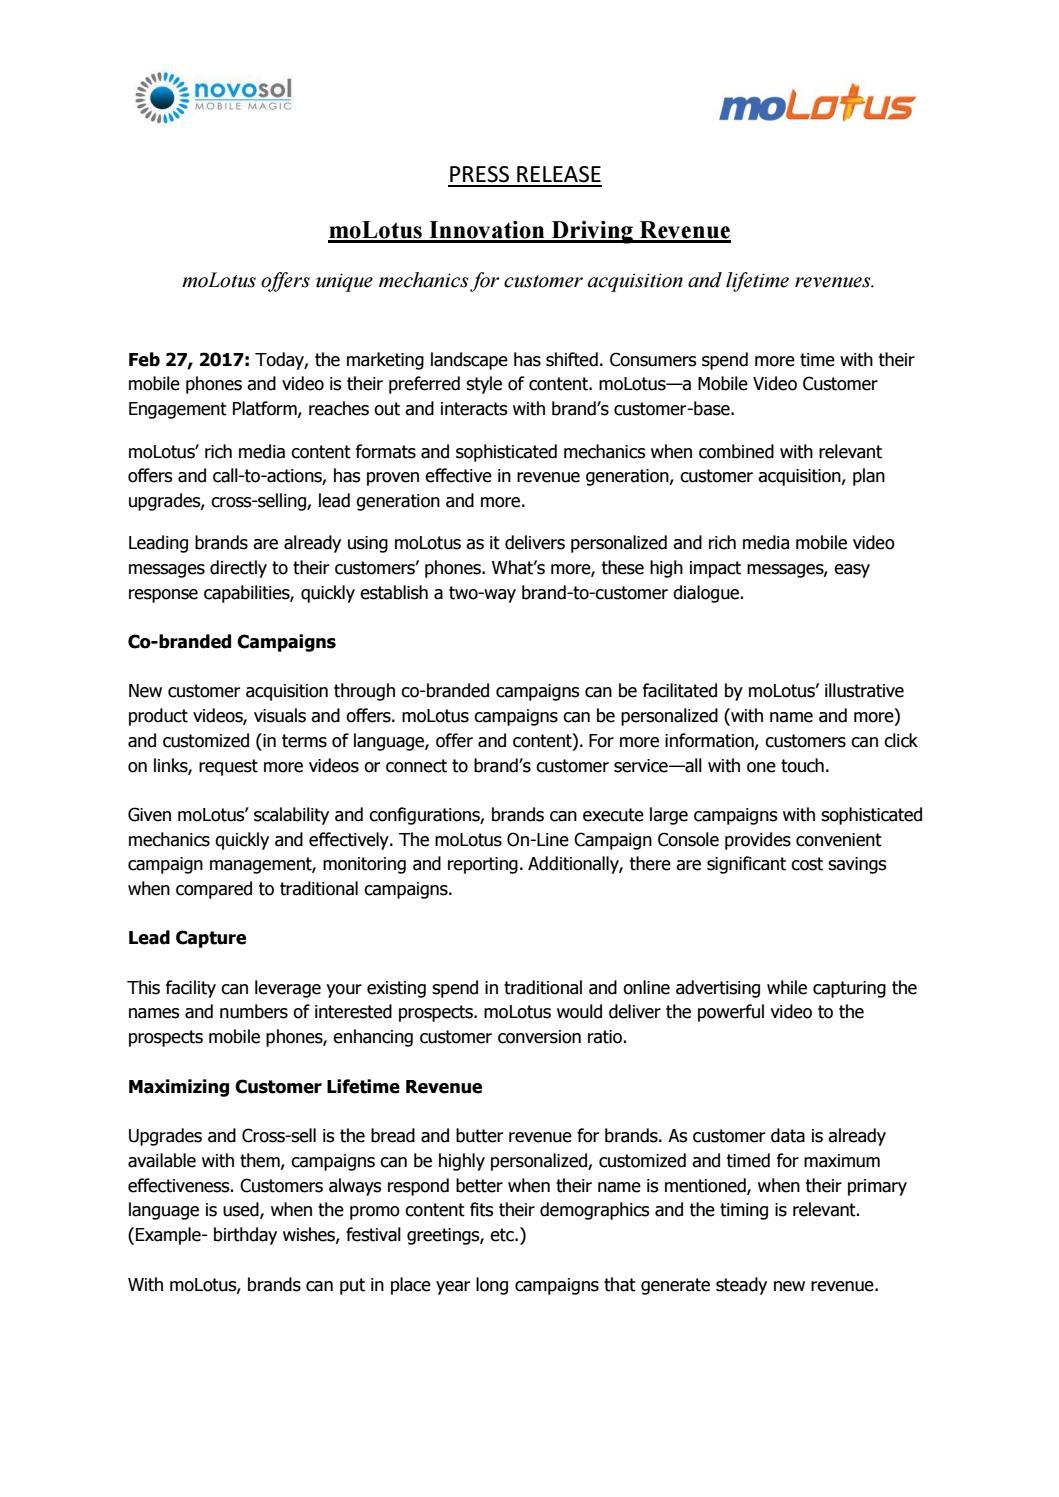 Molotus offers unique mechanics for customer acquisition and molotus offers unique mechanics for customer acquisition and lifetime revenues by molotus issuu kristyandbryce Images